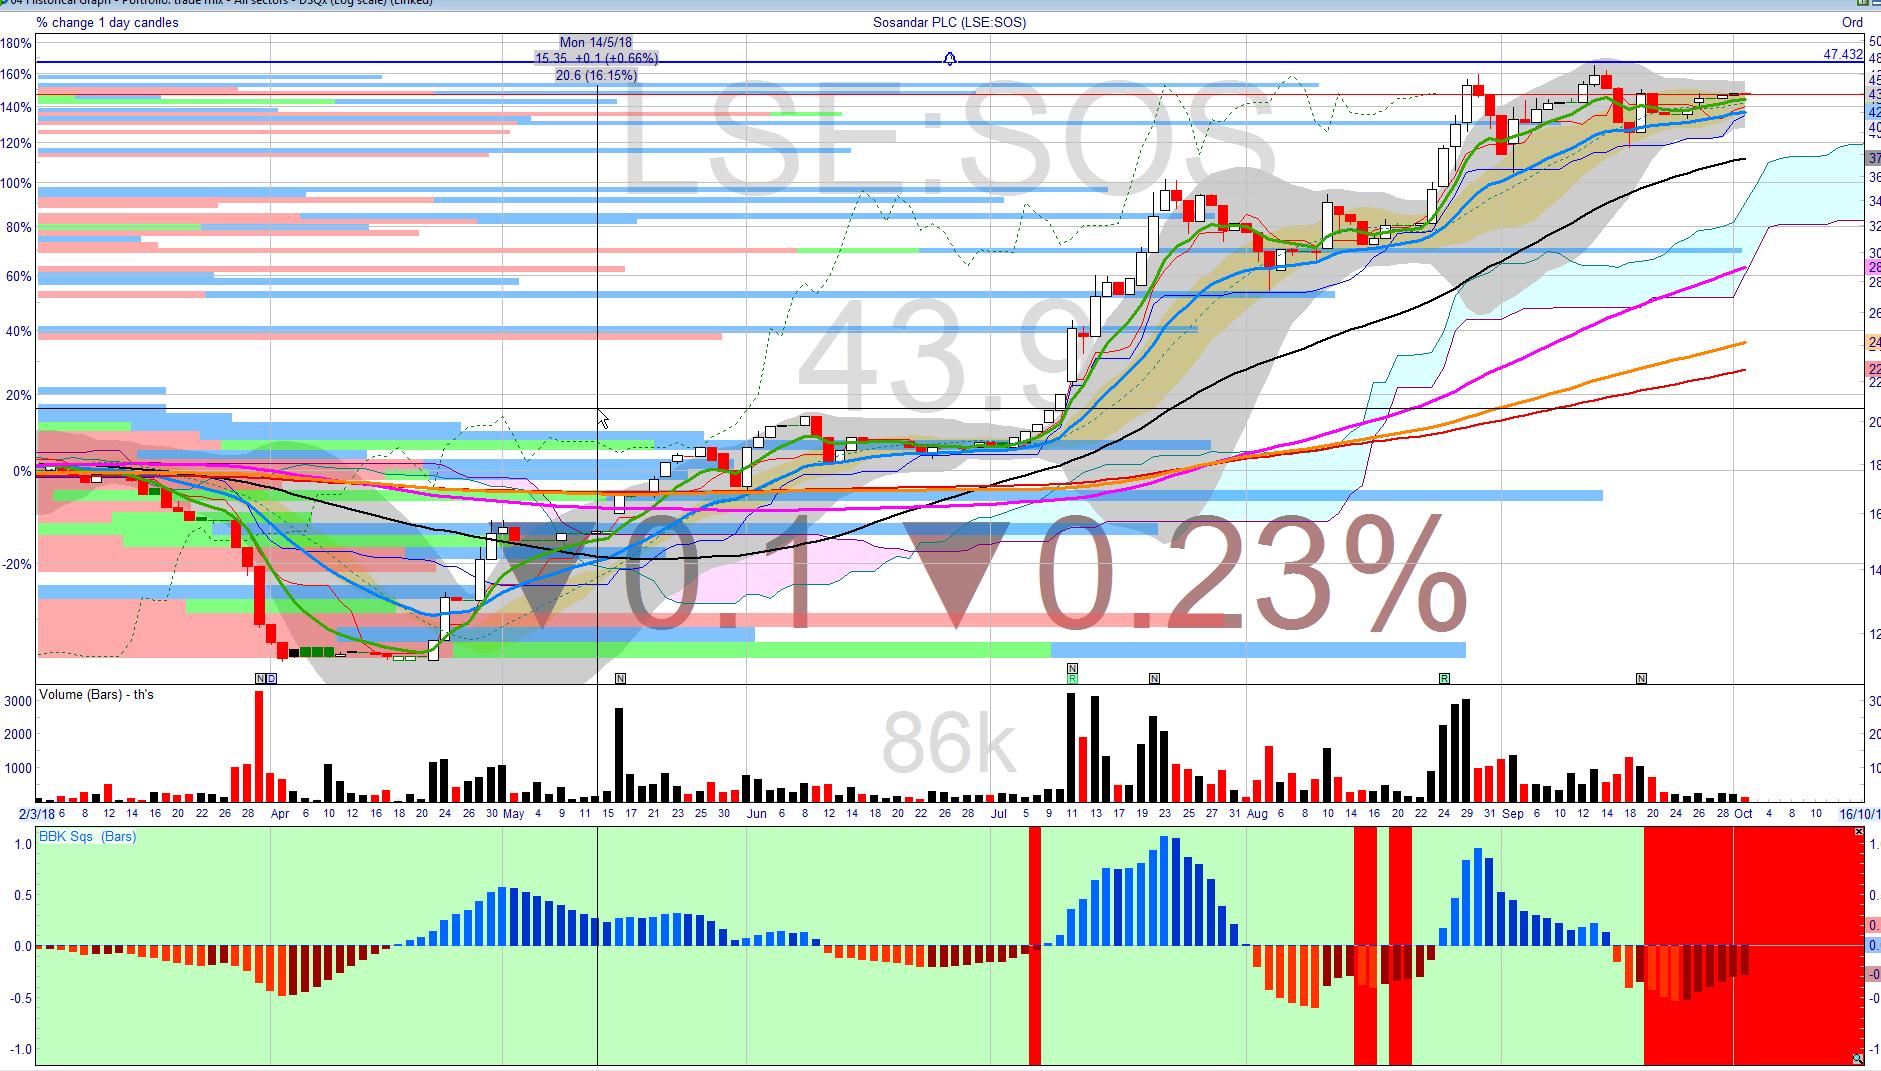 5bb373cee6e36sos_chart.png